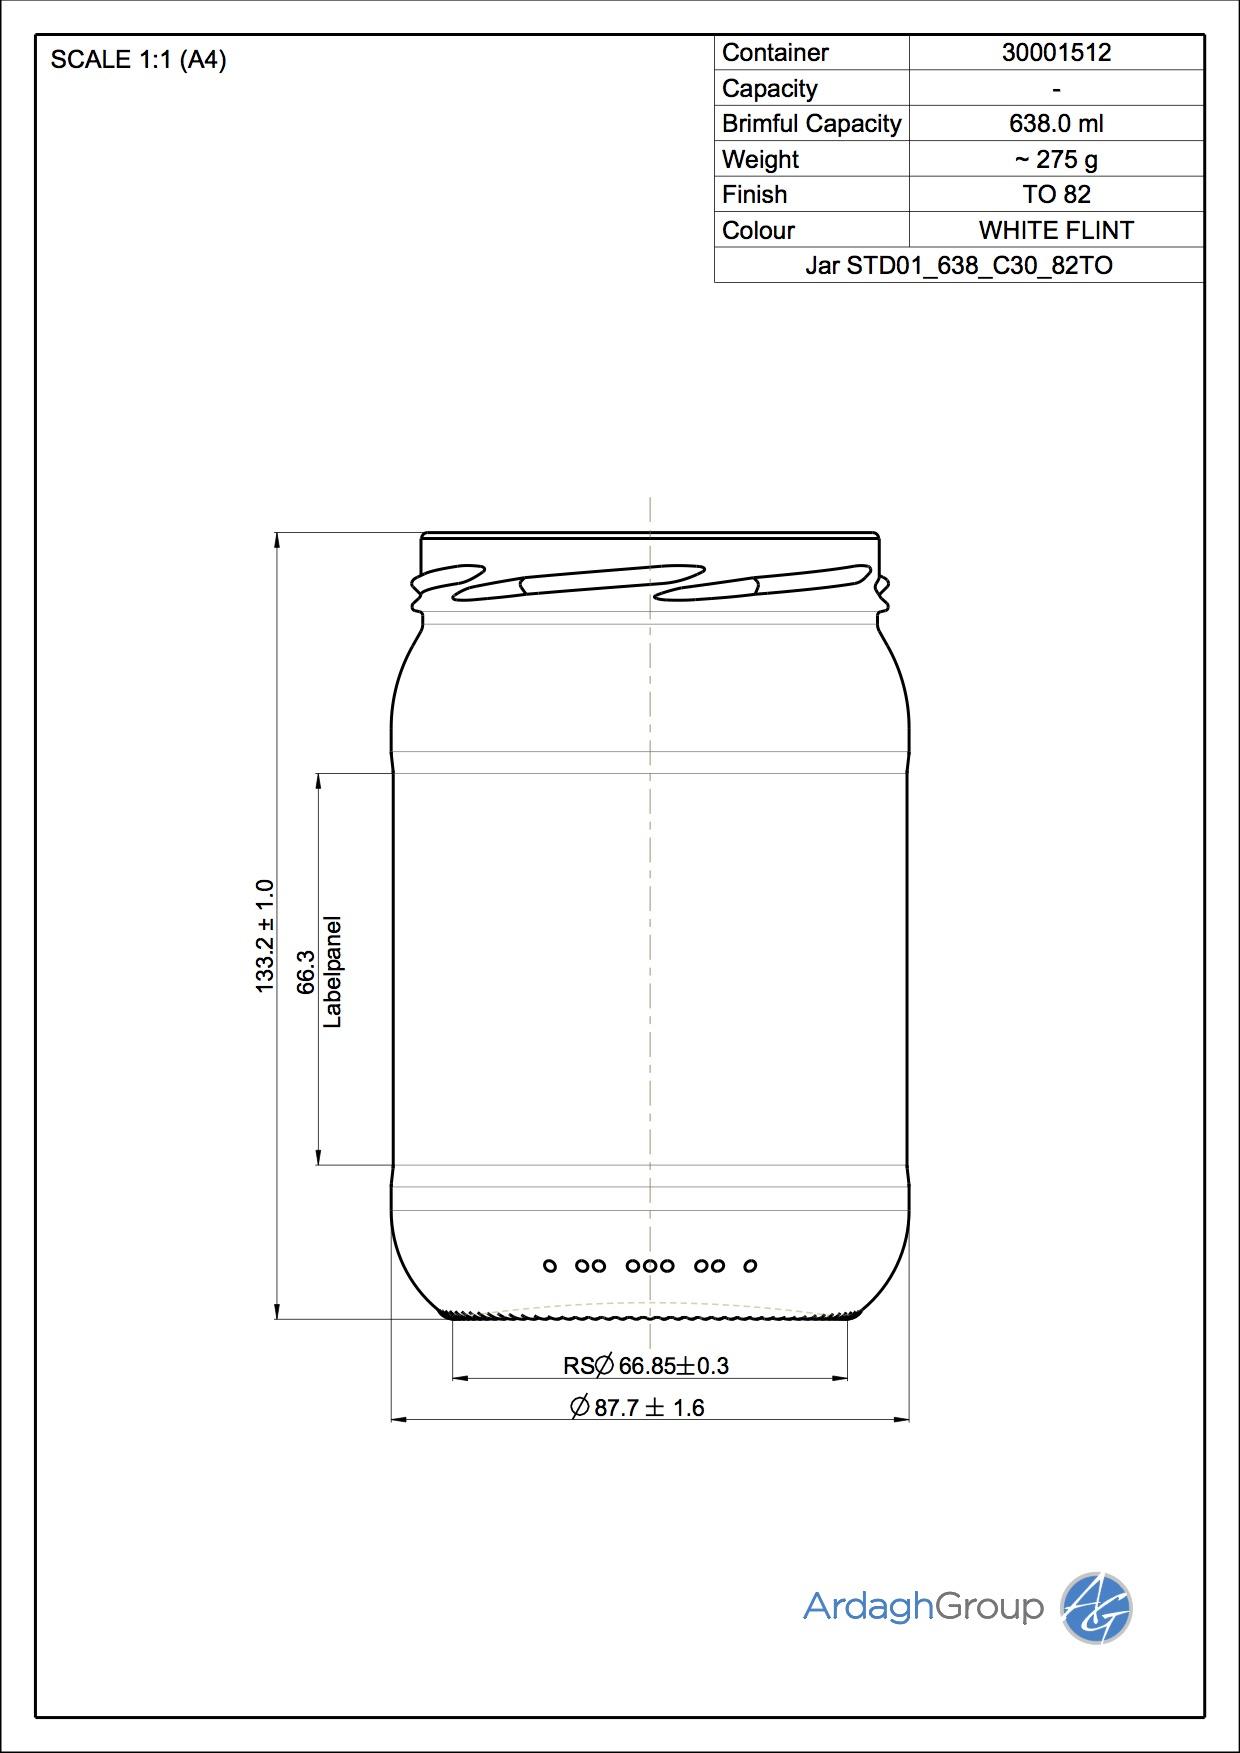 Jar STD01 638 C30 82TO